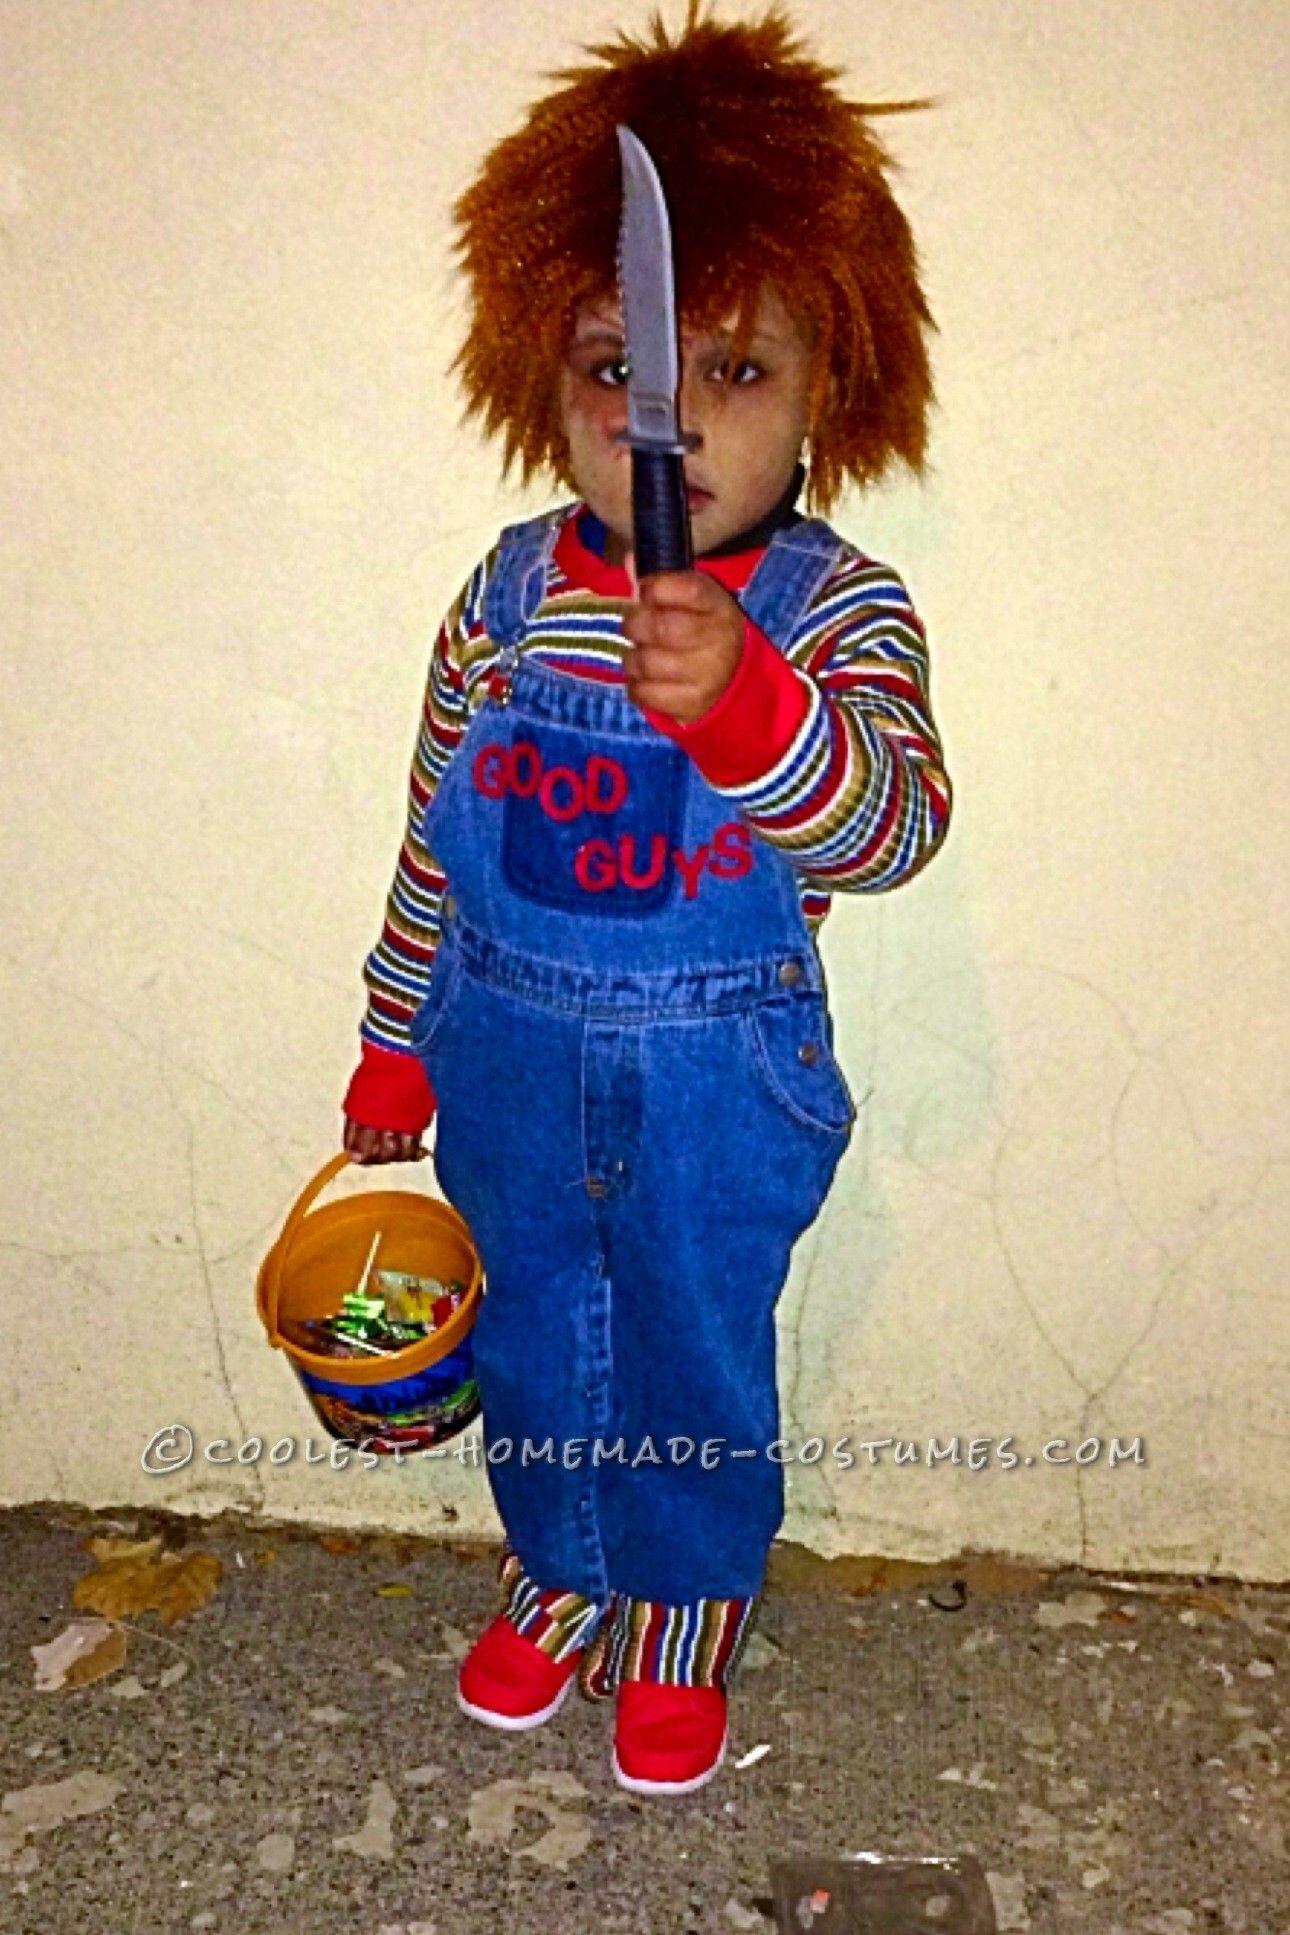 Cool Chucky Homemade Toddler Costume Homemade toddler